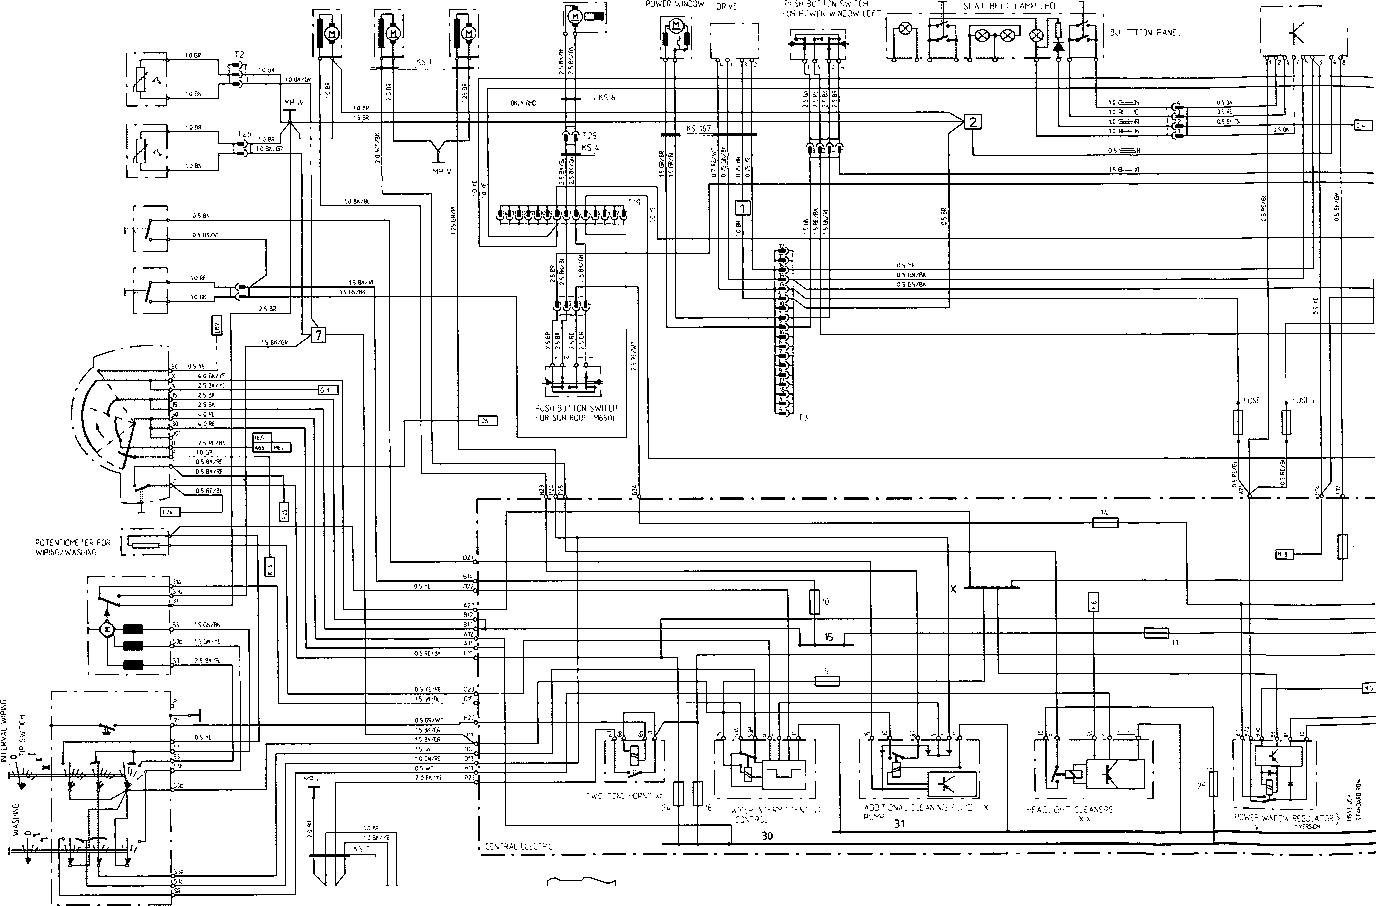 [DIAGRAM_5NL]  879F943 Porsche 911 Turbo Wiring Diagram | Wiring Library | 1984 Porsche 911 Carrera Fuse Diagram |  | Wiring Library